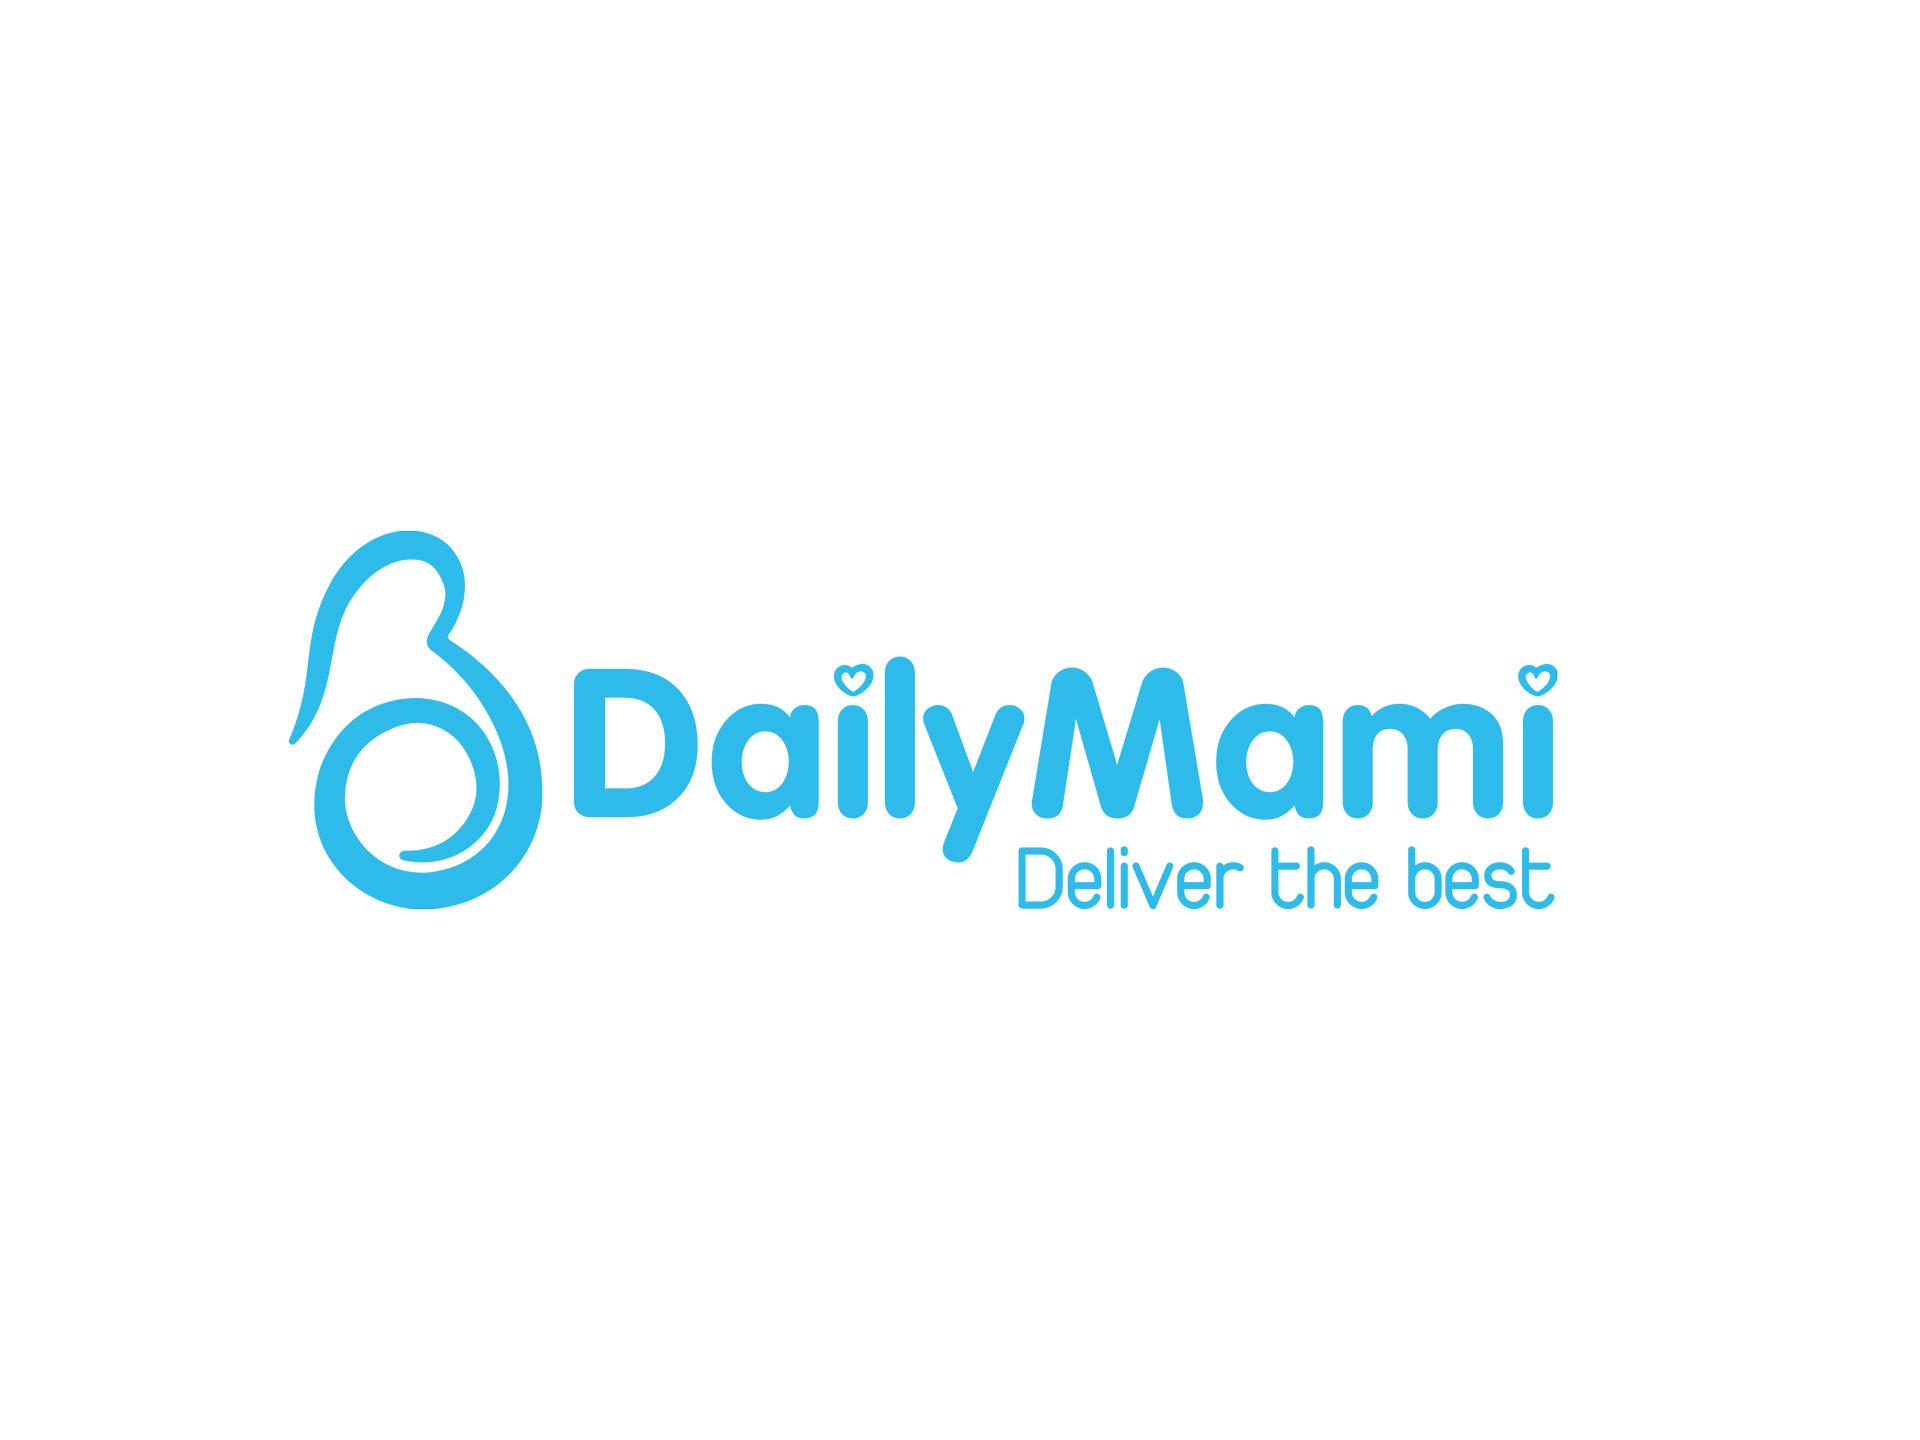 Daily Mami